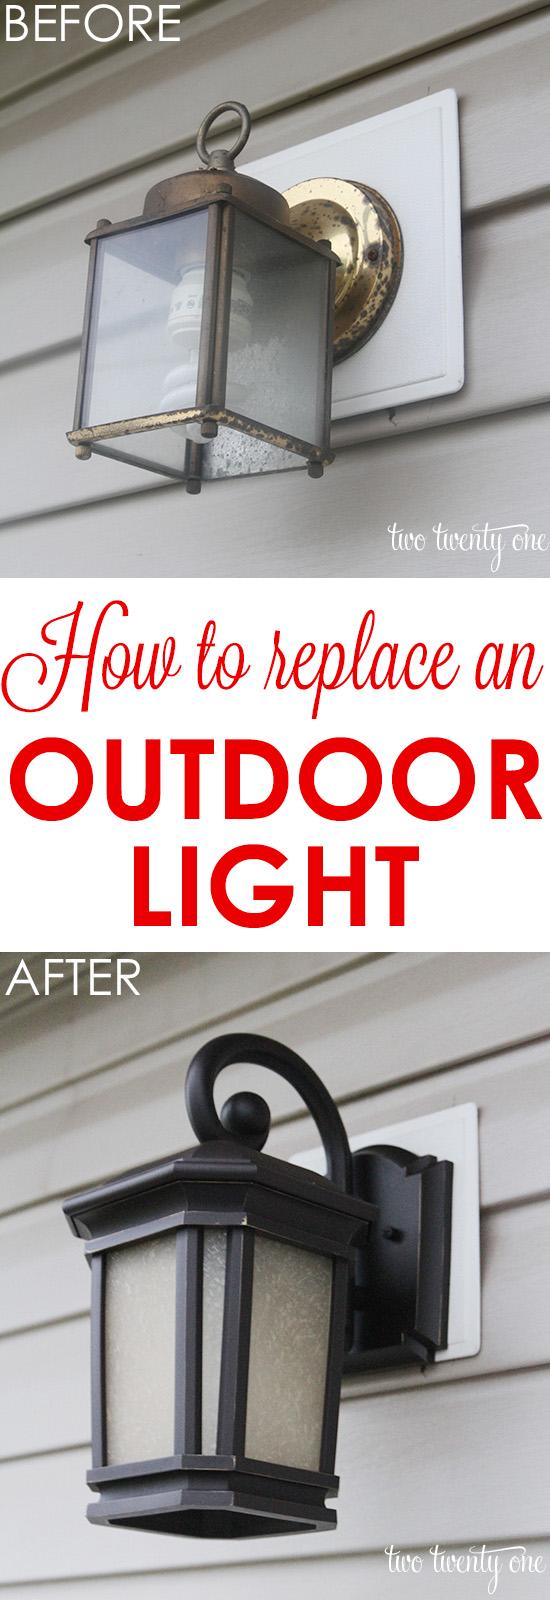 21 Replace or Upgrade Outdoor Lights Simphome com